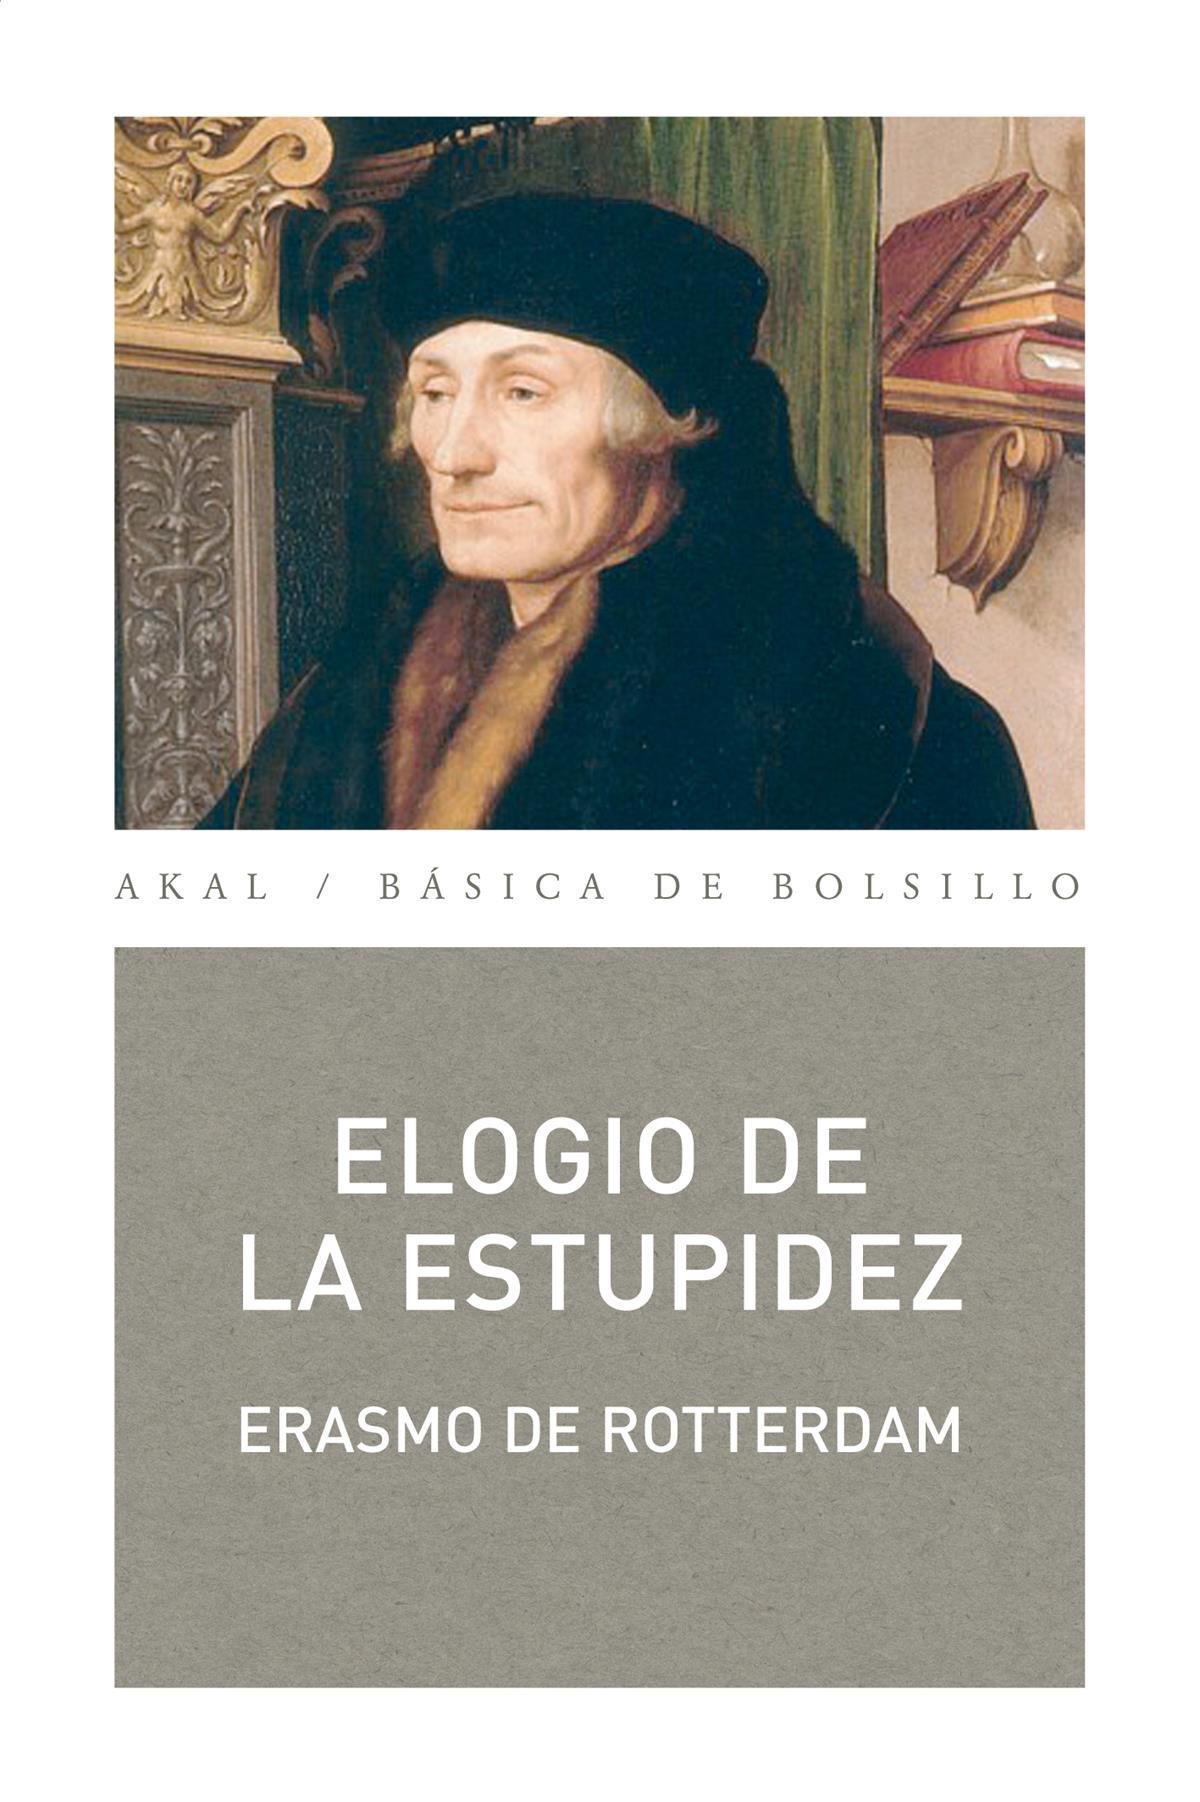 Elogio de la Estupidez (Spanish Edition): Erasmo De Rotterdam: 9788446033219: Amazon.com: Books